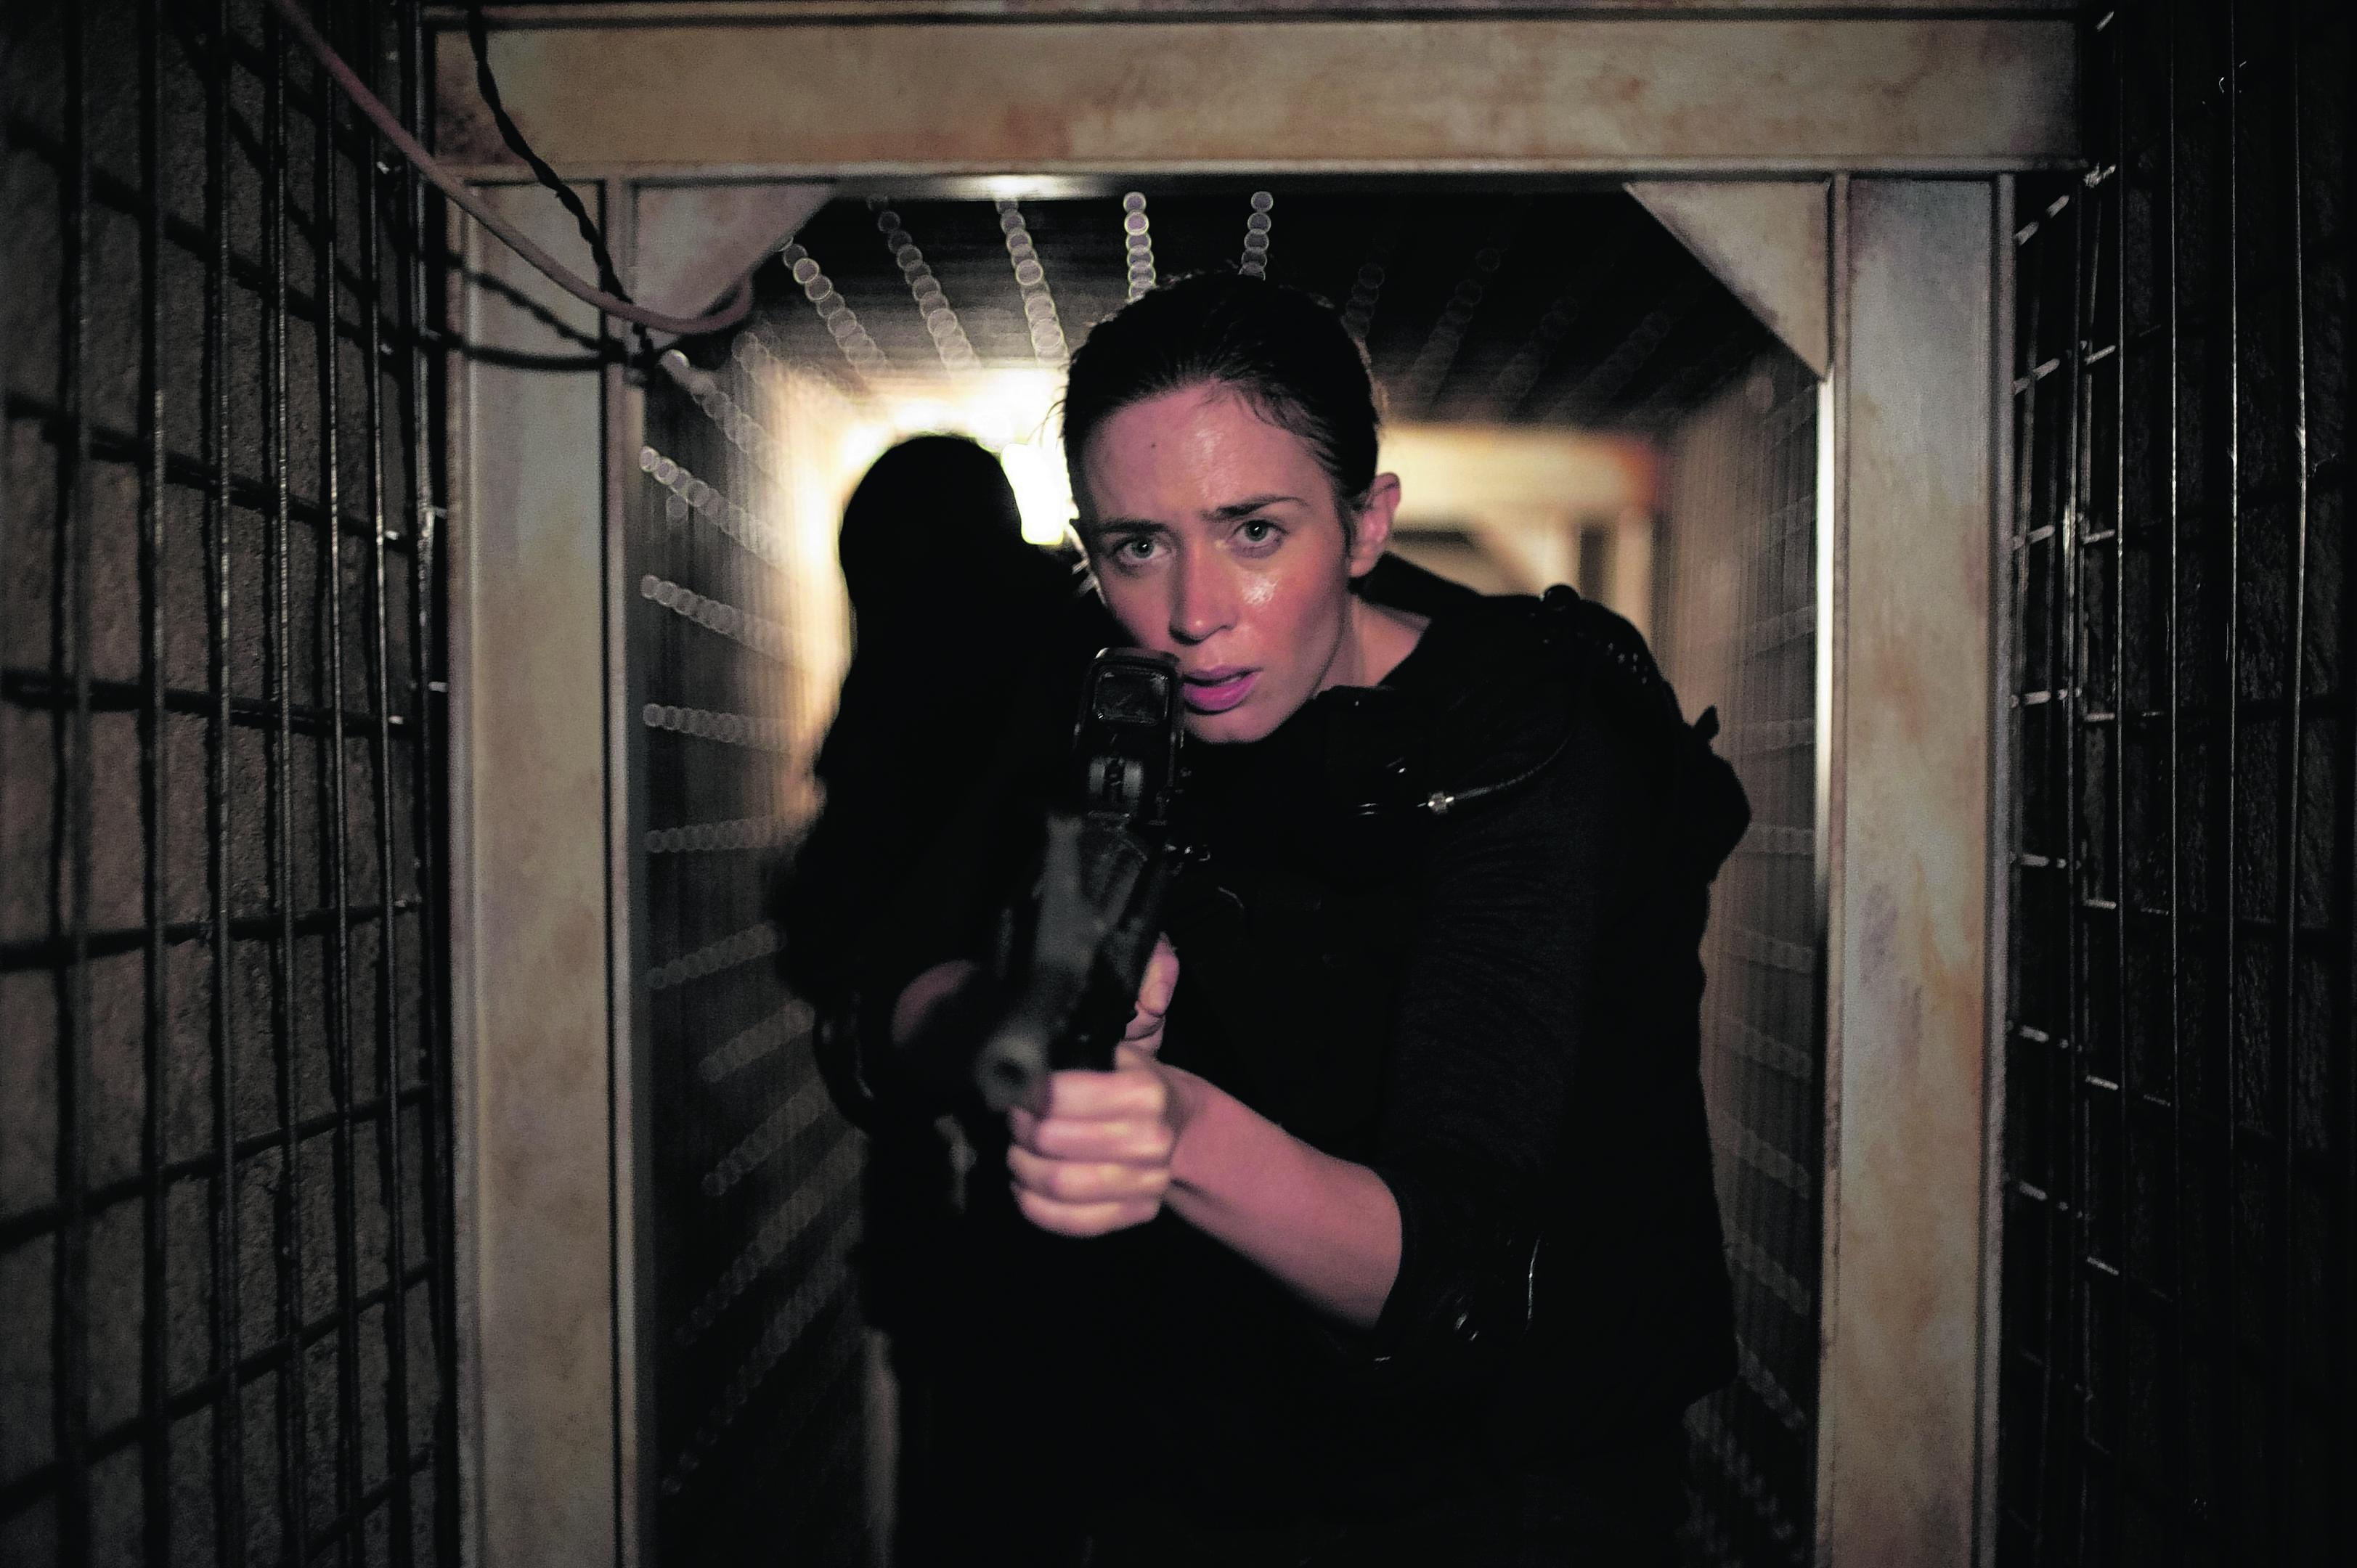 Emily Blunt as Kate Macer in tense thriller Sicario